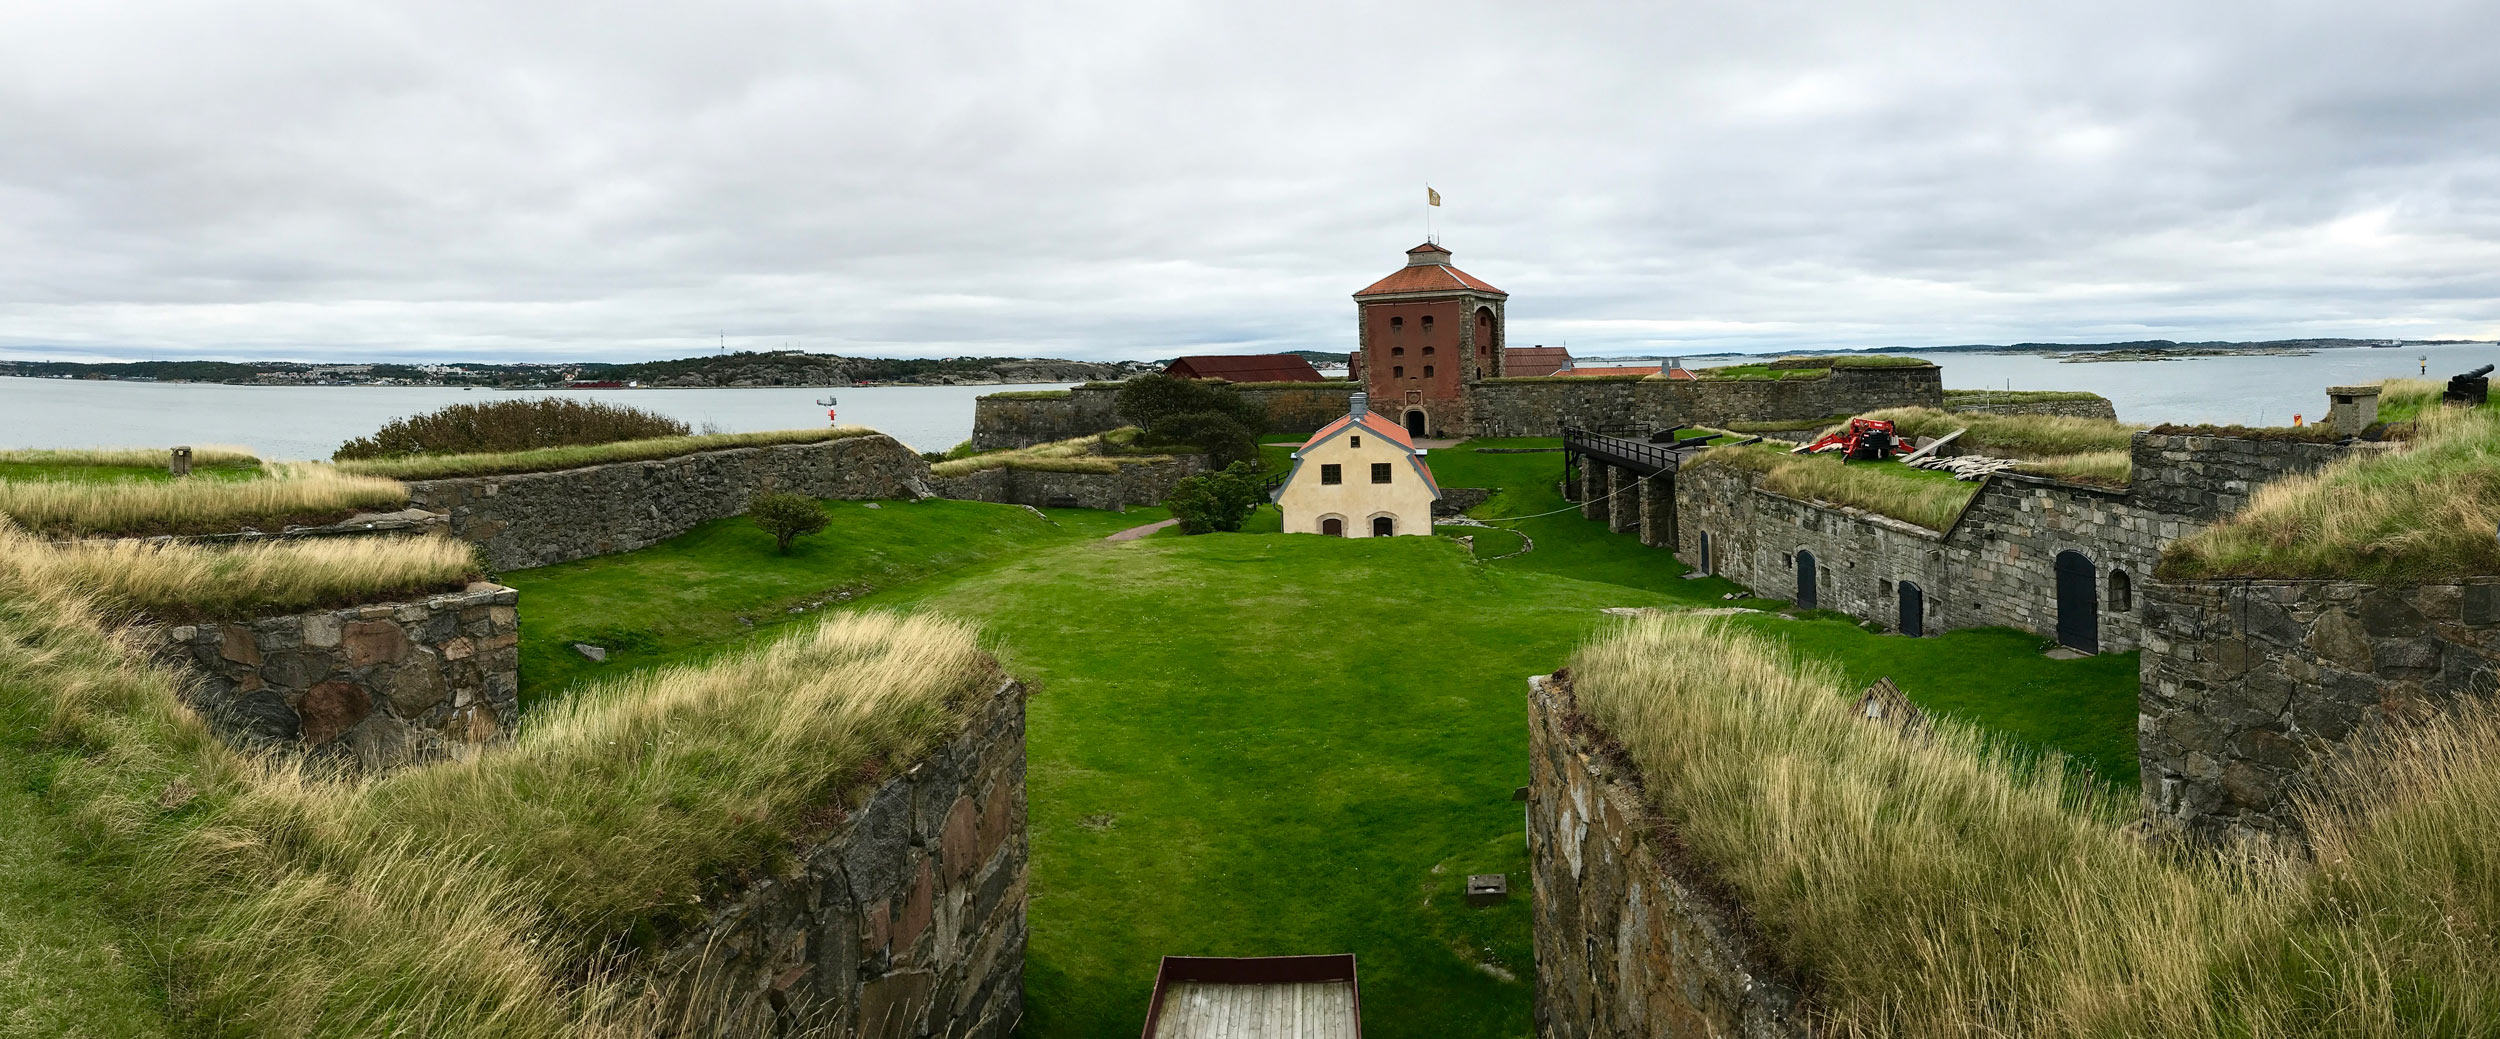 OceanEvent auf Site-Insepction im Norden